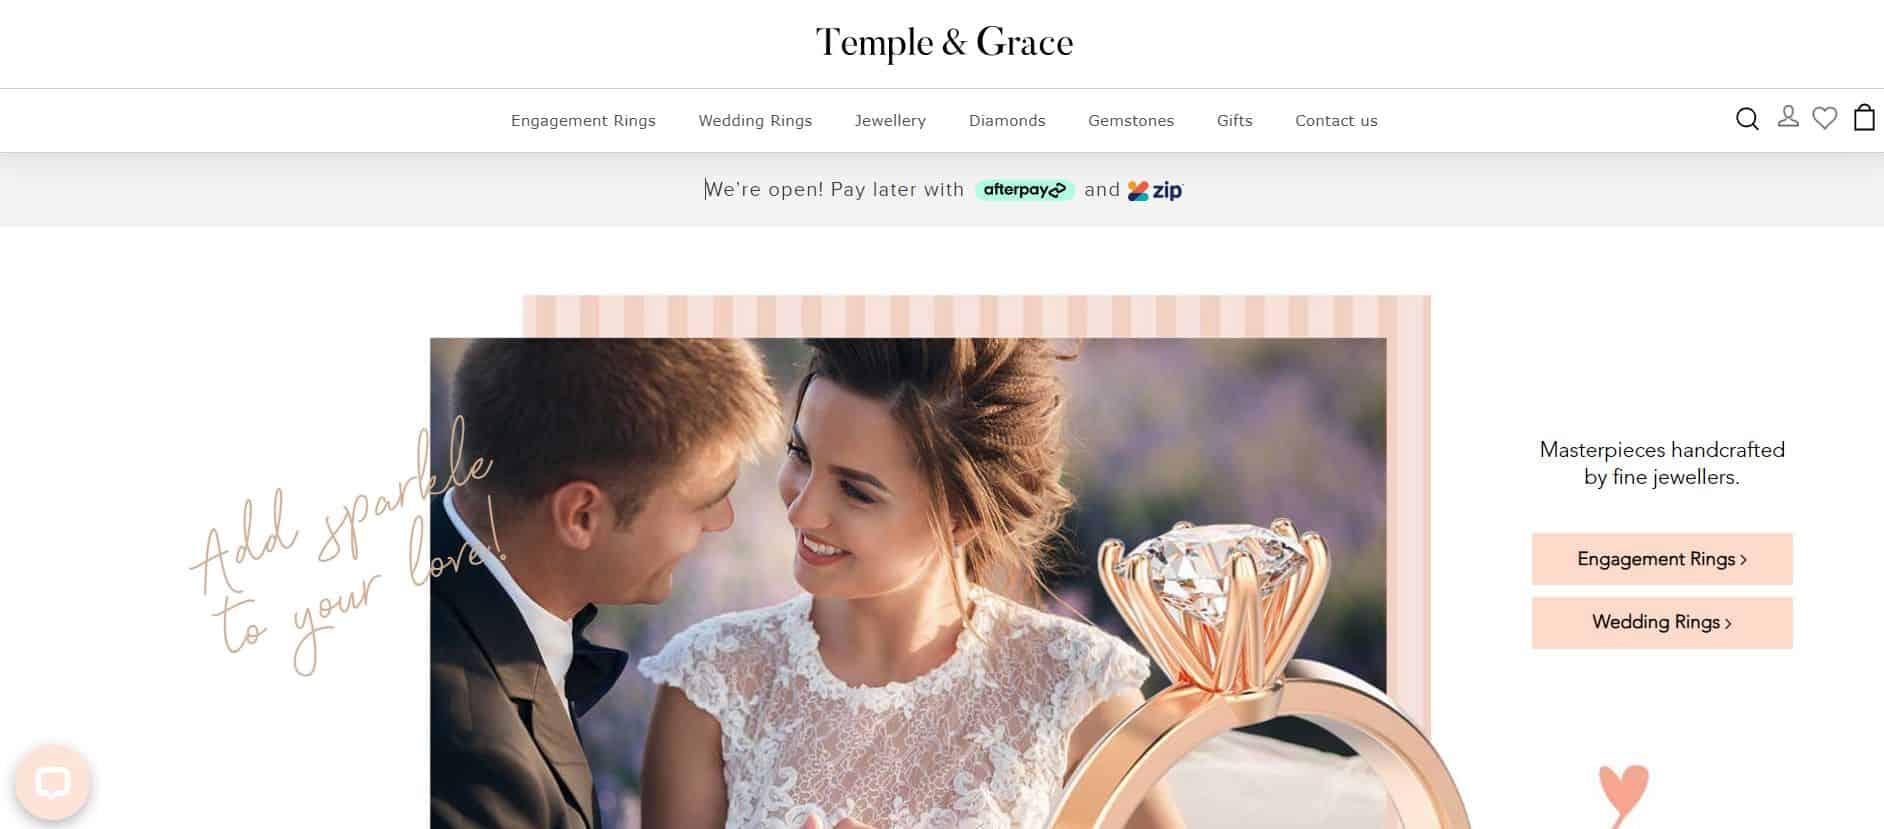 temple & grace